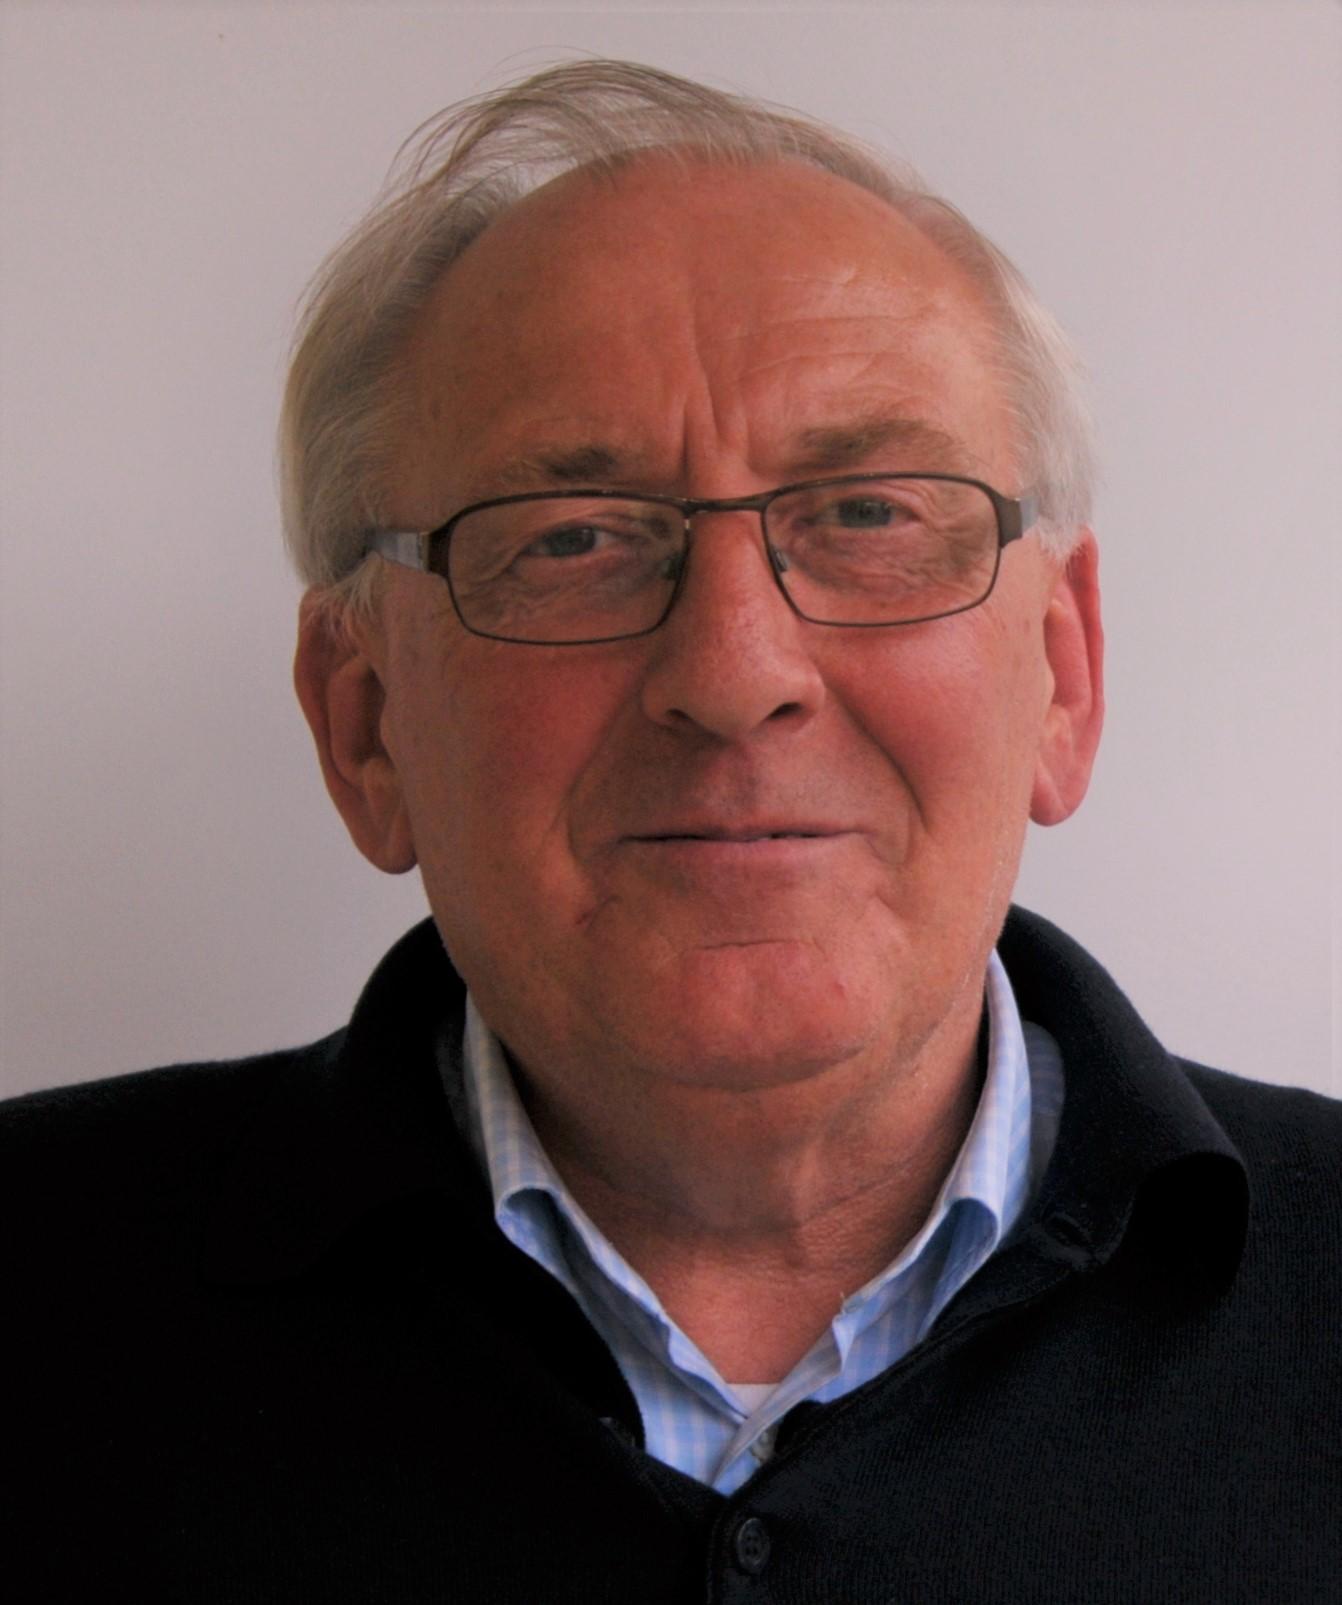 Michael Lindken